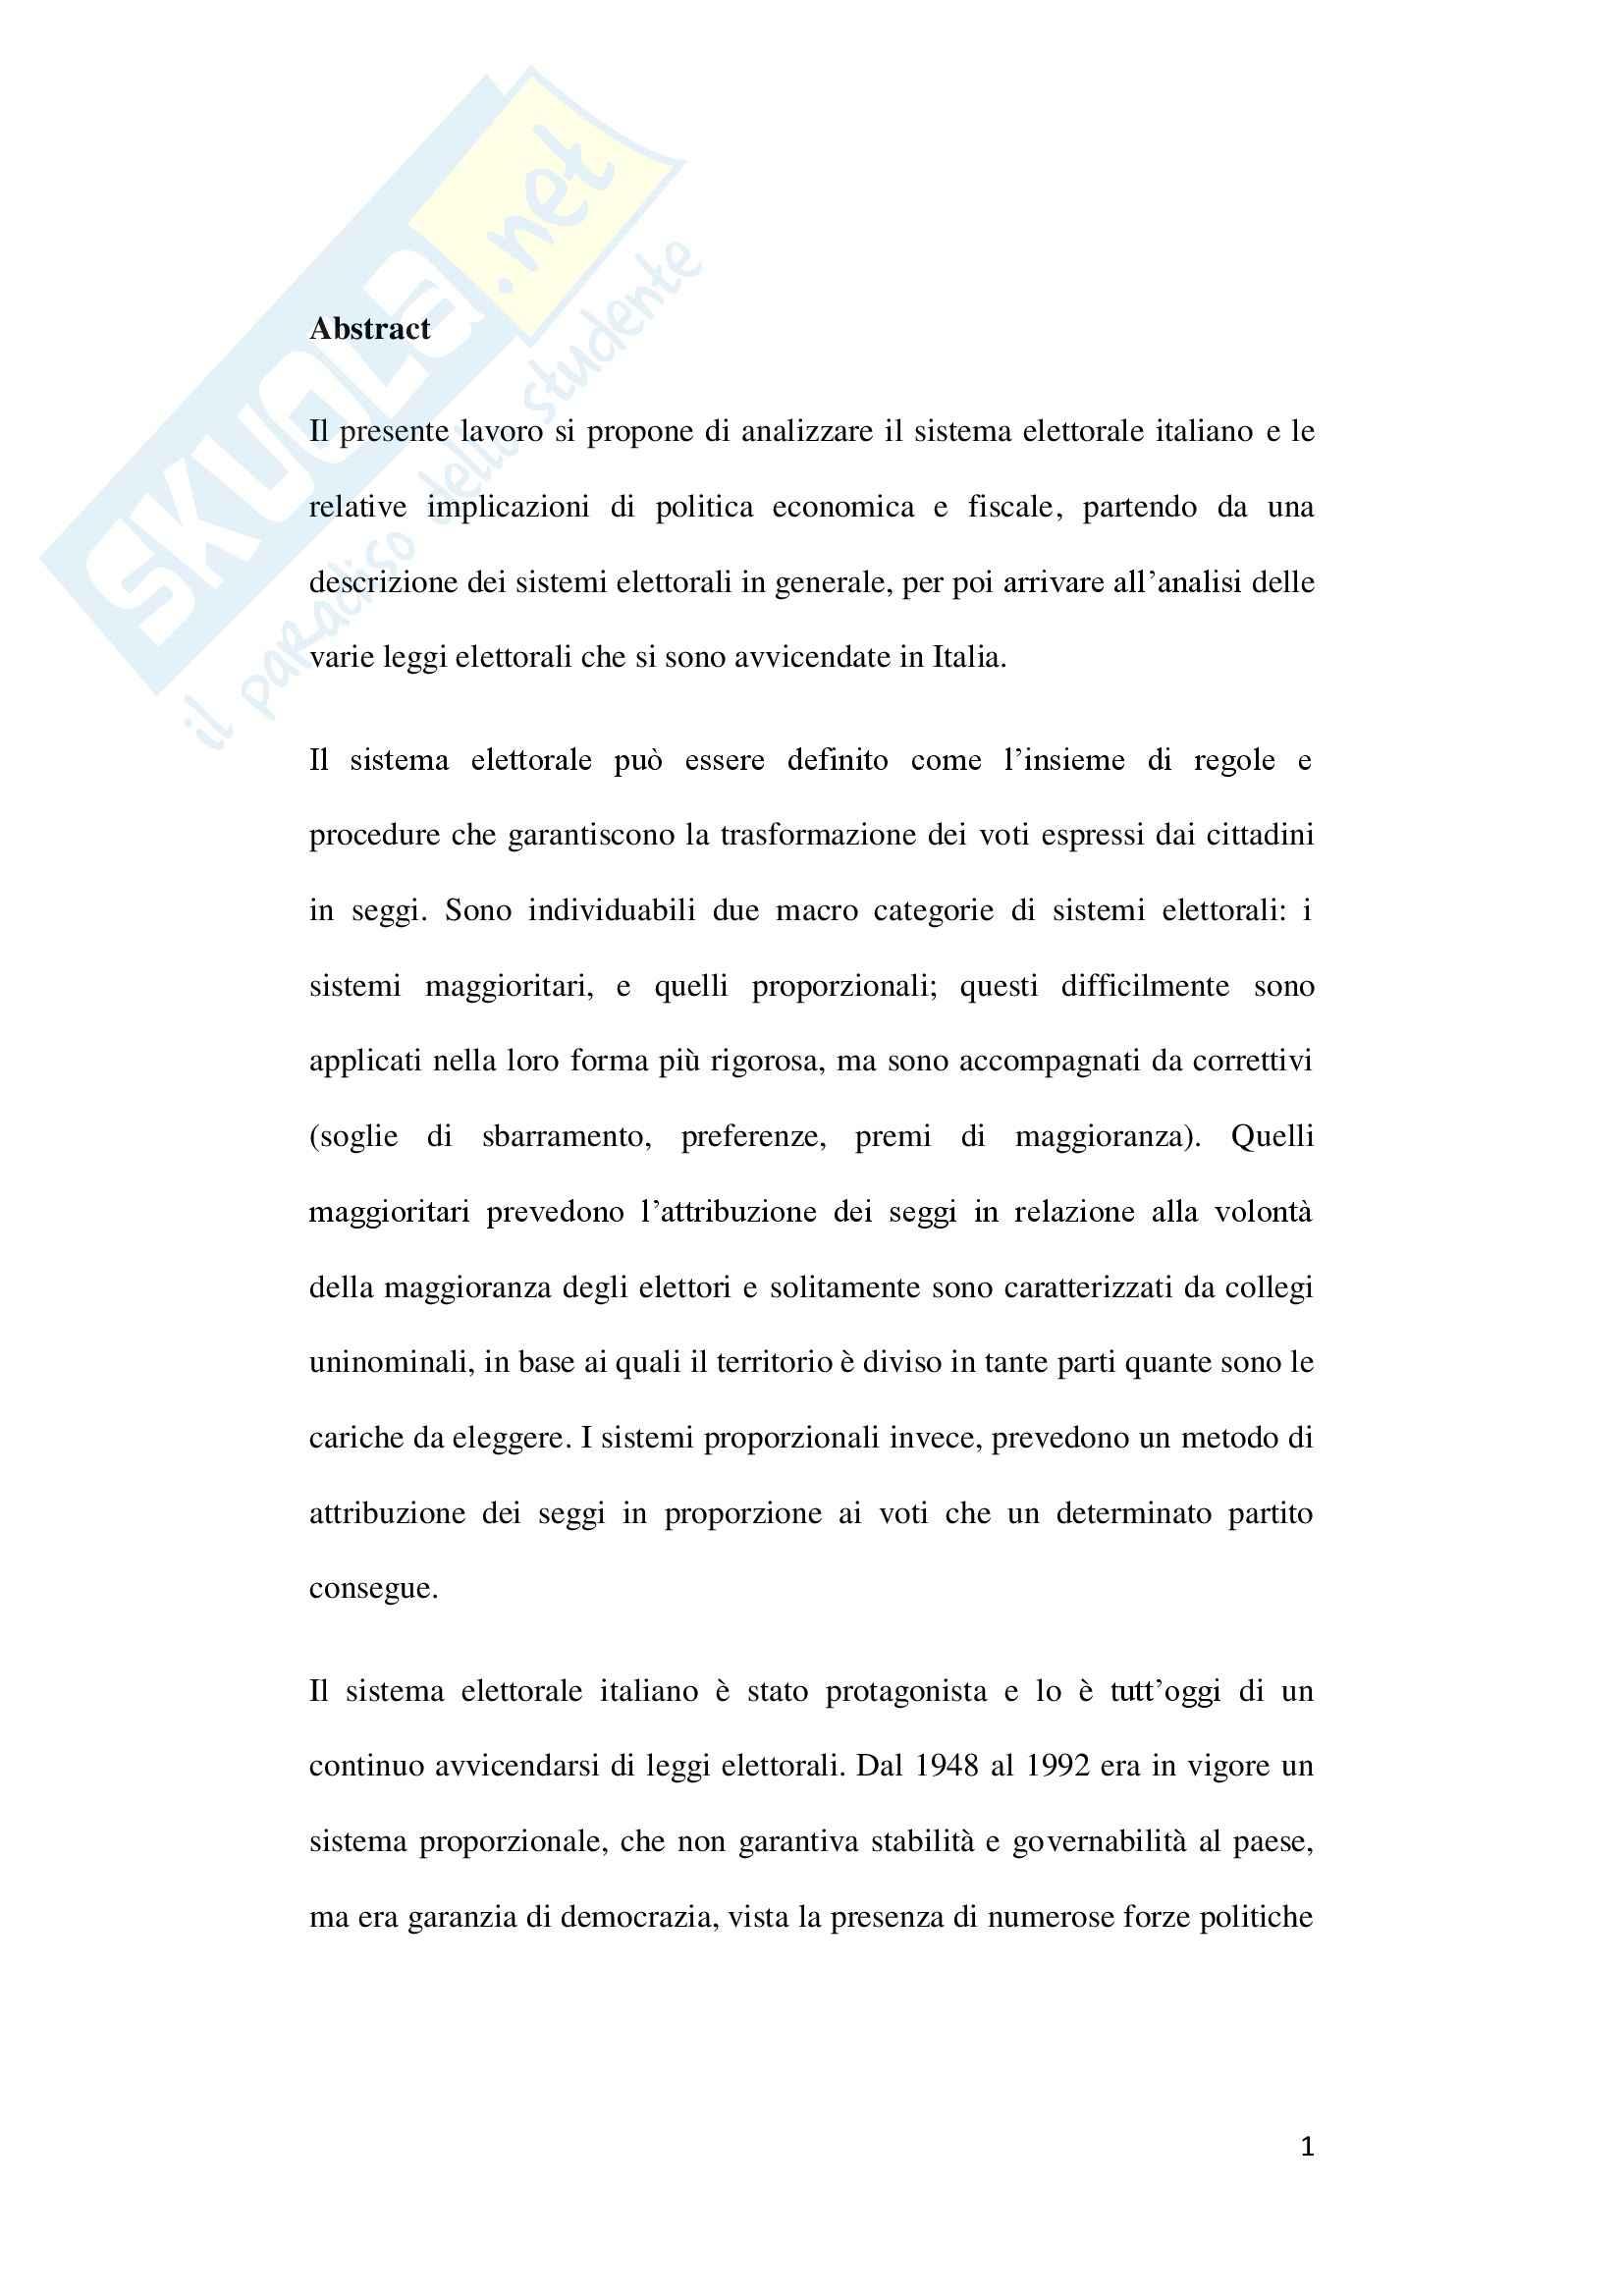 Sistema elettorale italiano Pag. 2